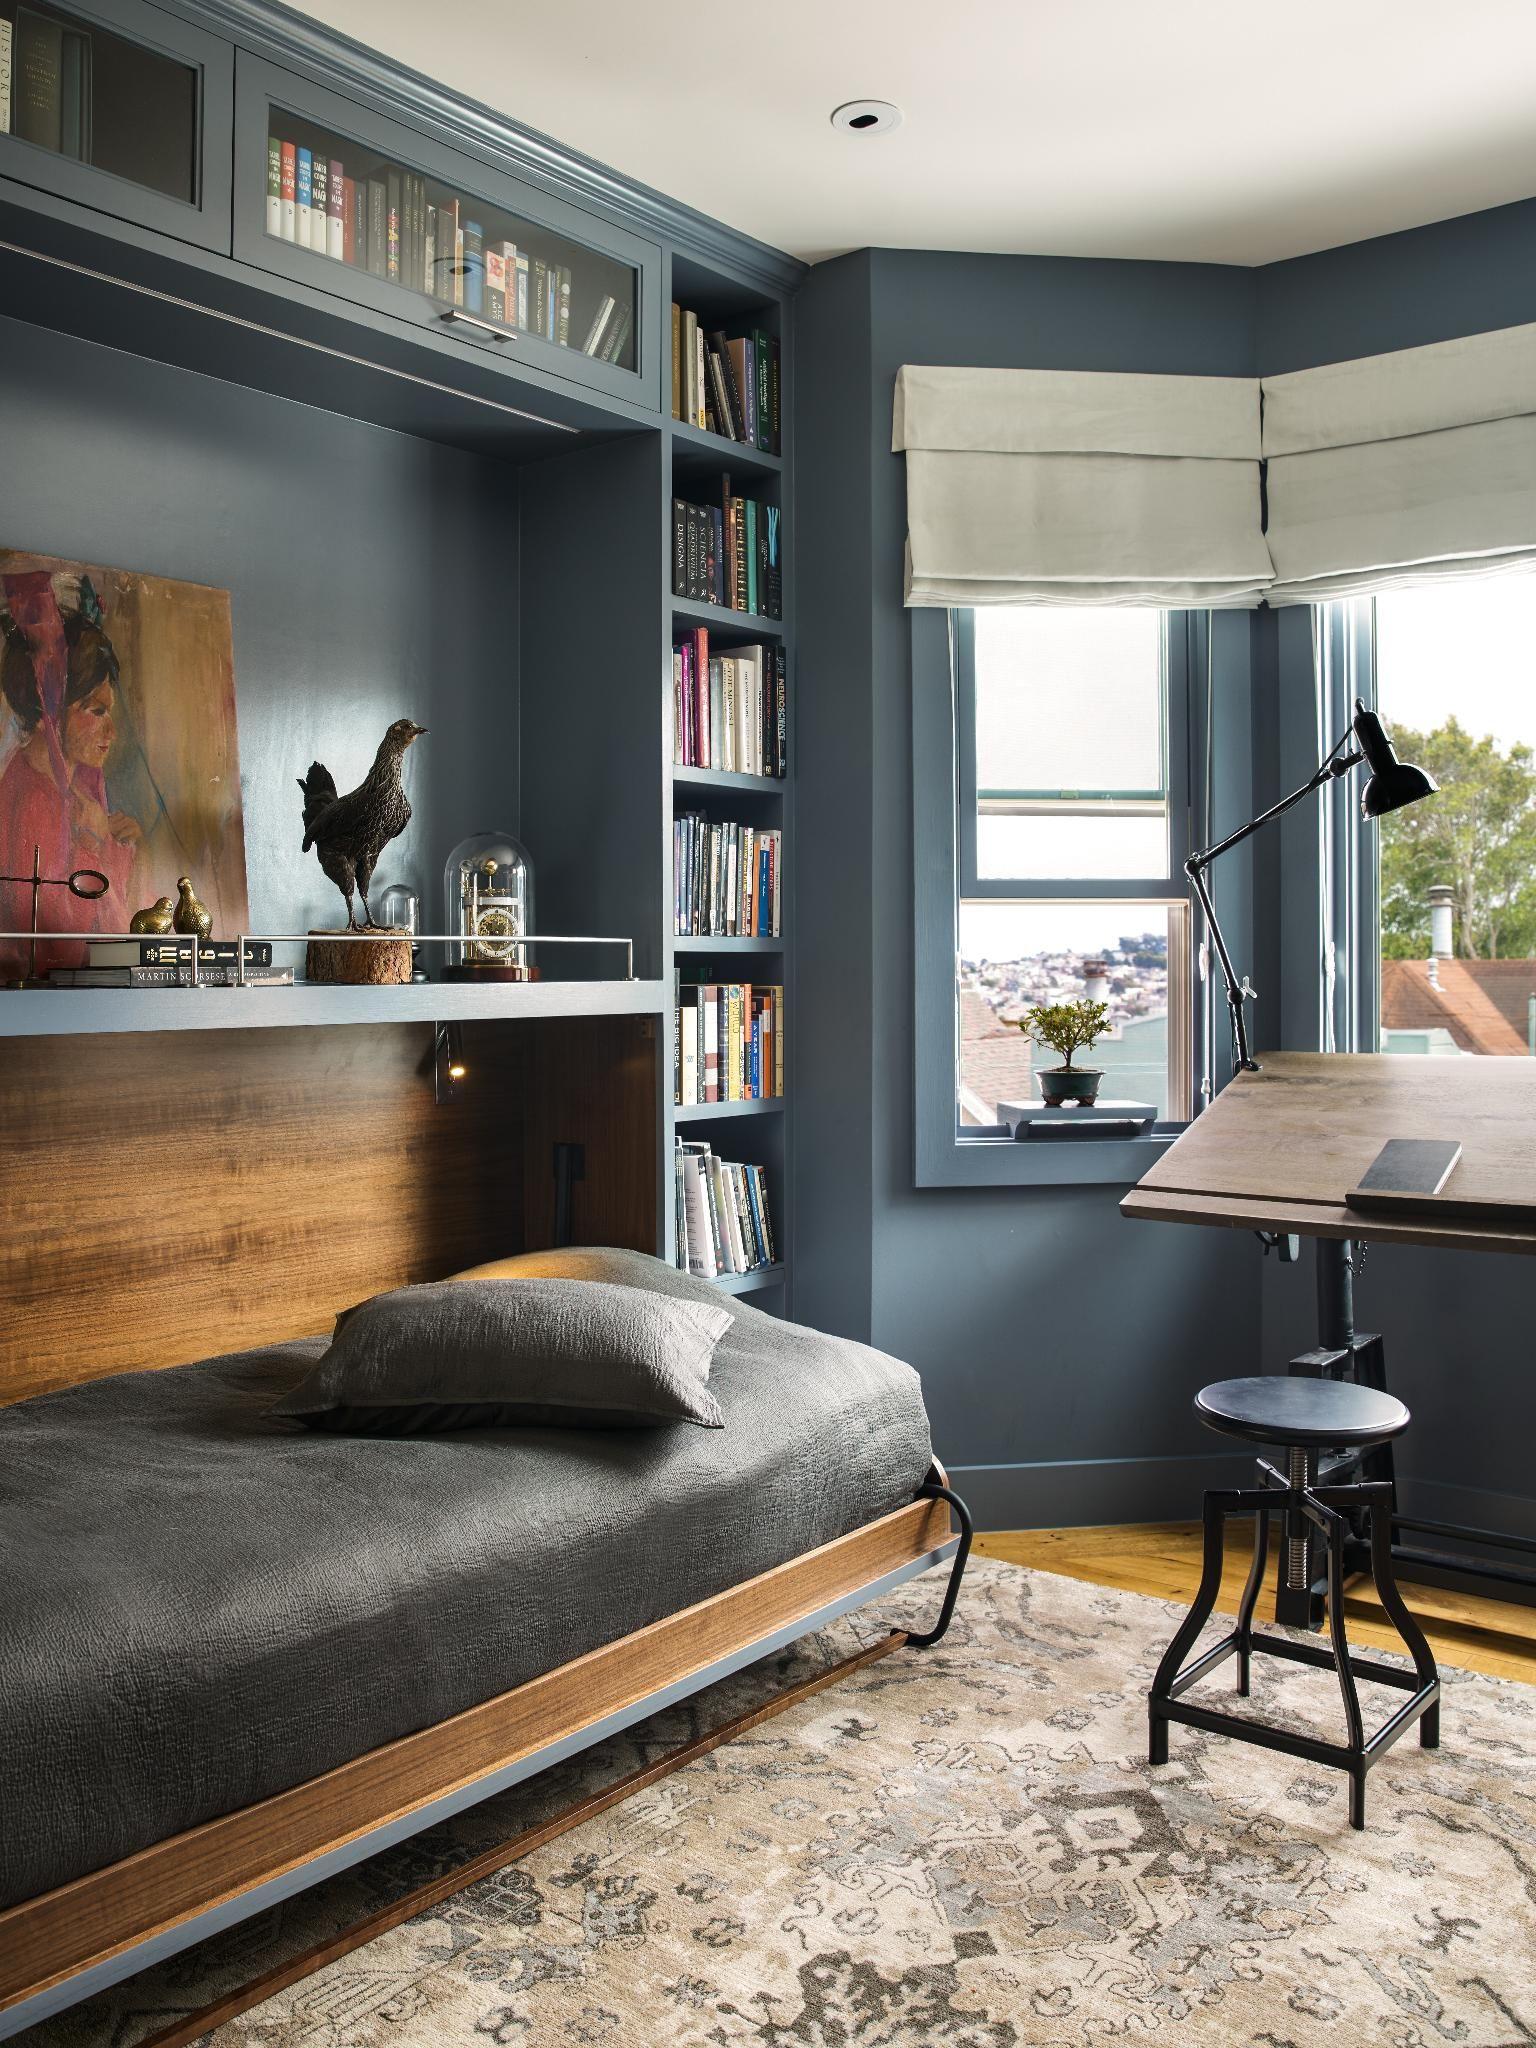 16 Multifunctional Guest Bedroom Ideas Hgtv Bedrooms